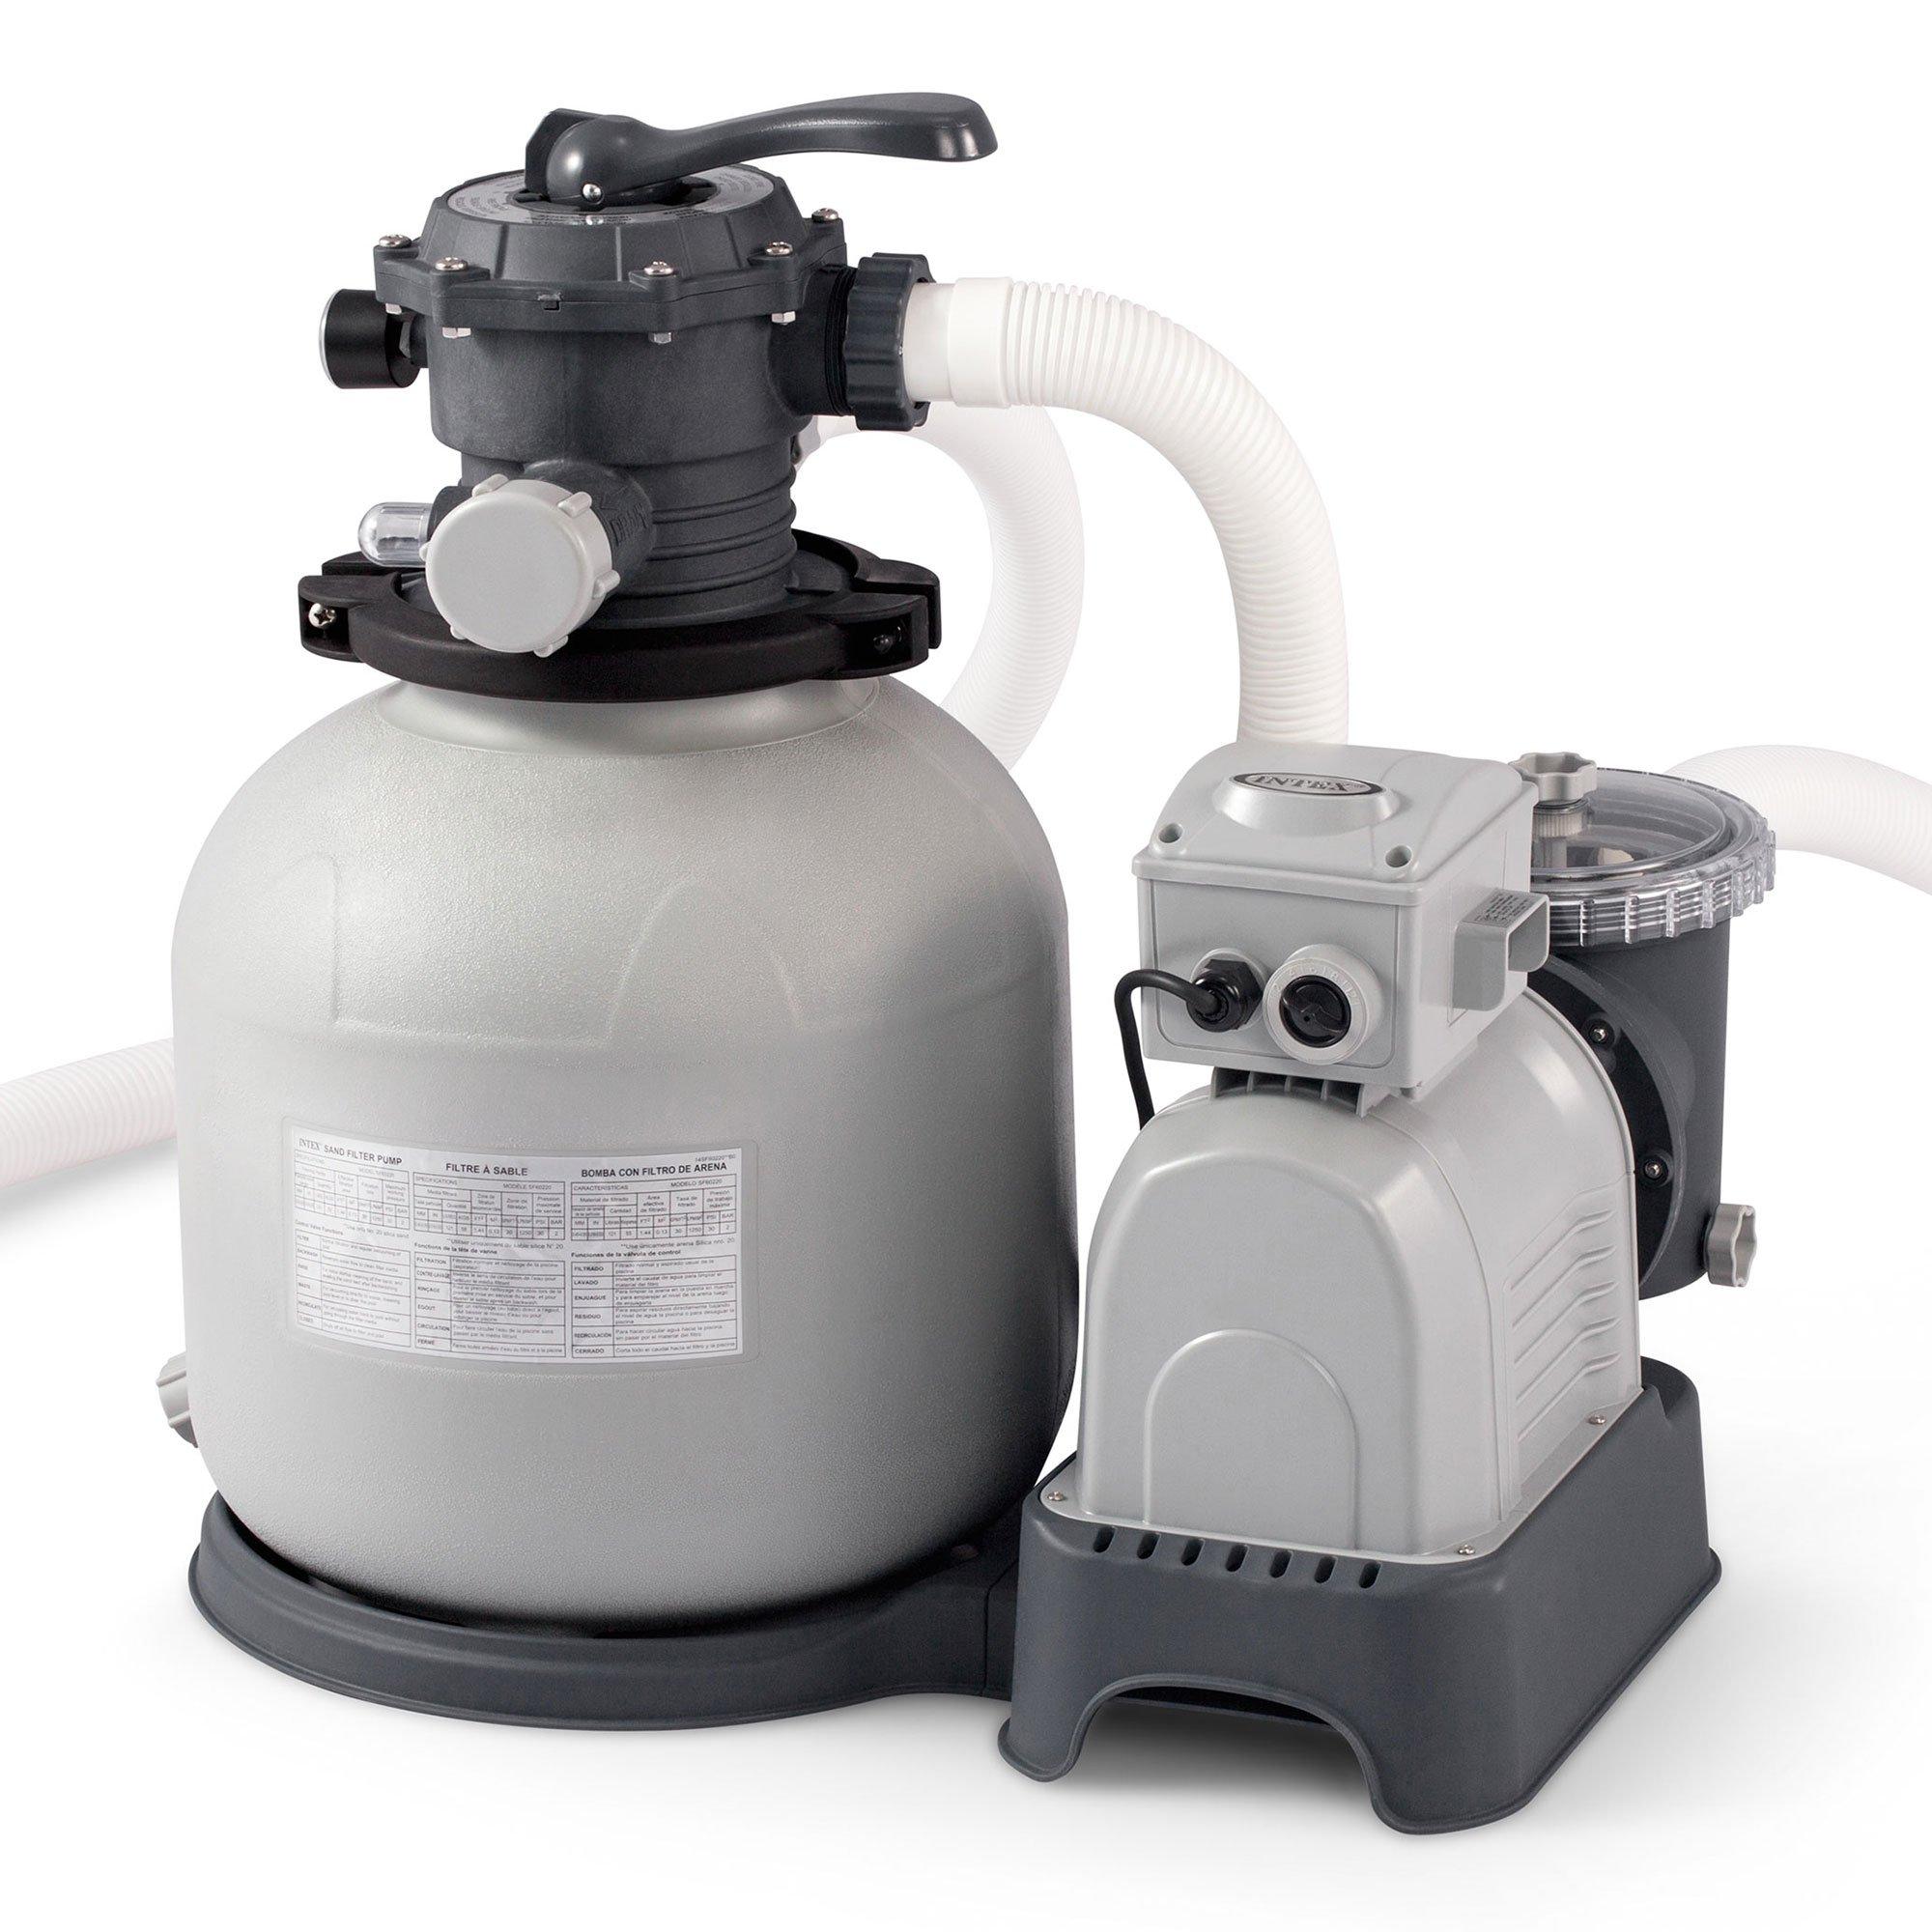 Amazon.com : Intex 3, 000-Gallon Sand Filter Pump : Swimming Pool Water  Pumps : Garden & Outdoor